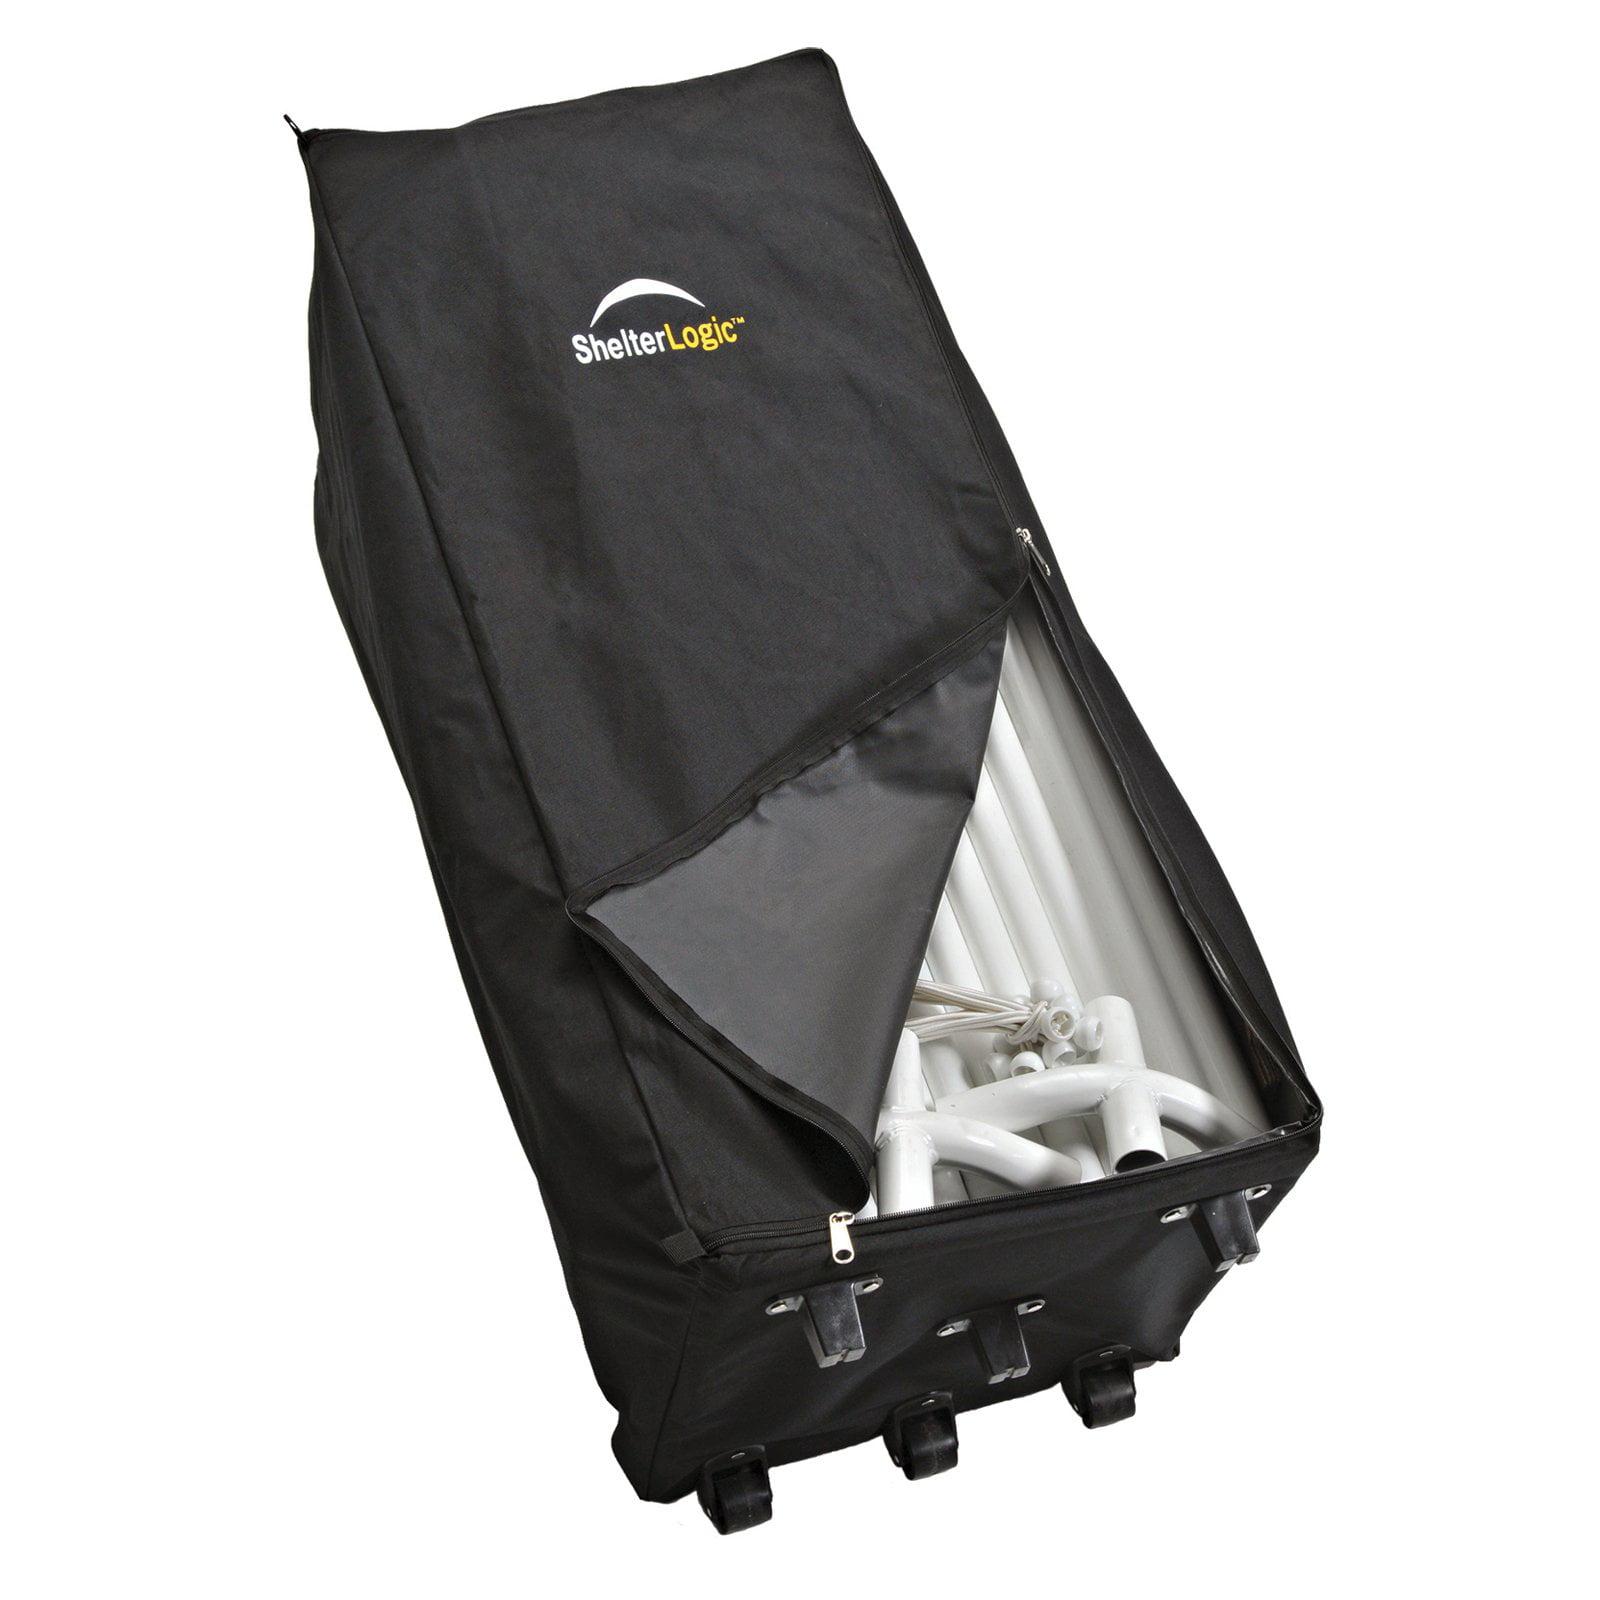 Store IT Canopy Rolling Storage Black Bag   Walmart.com